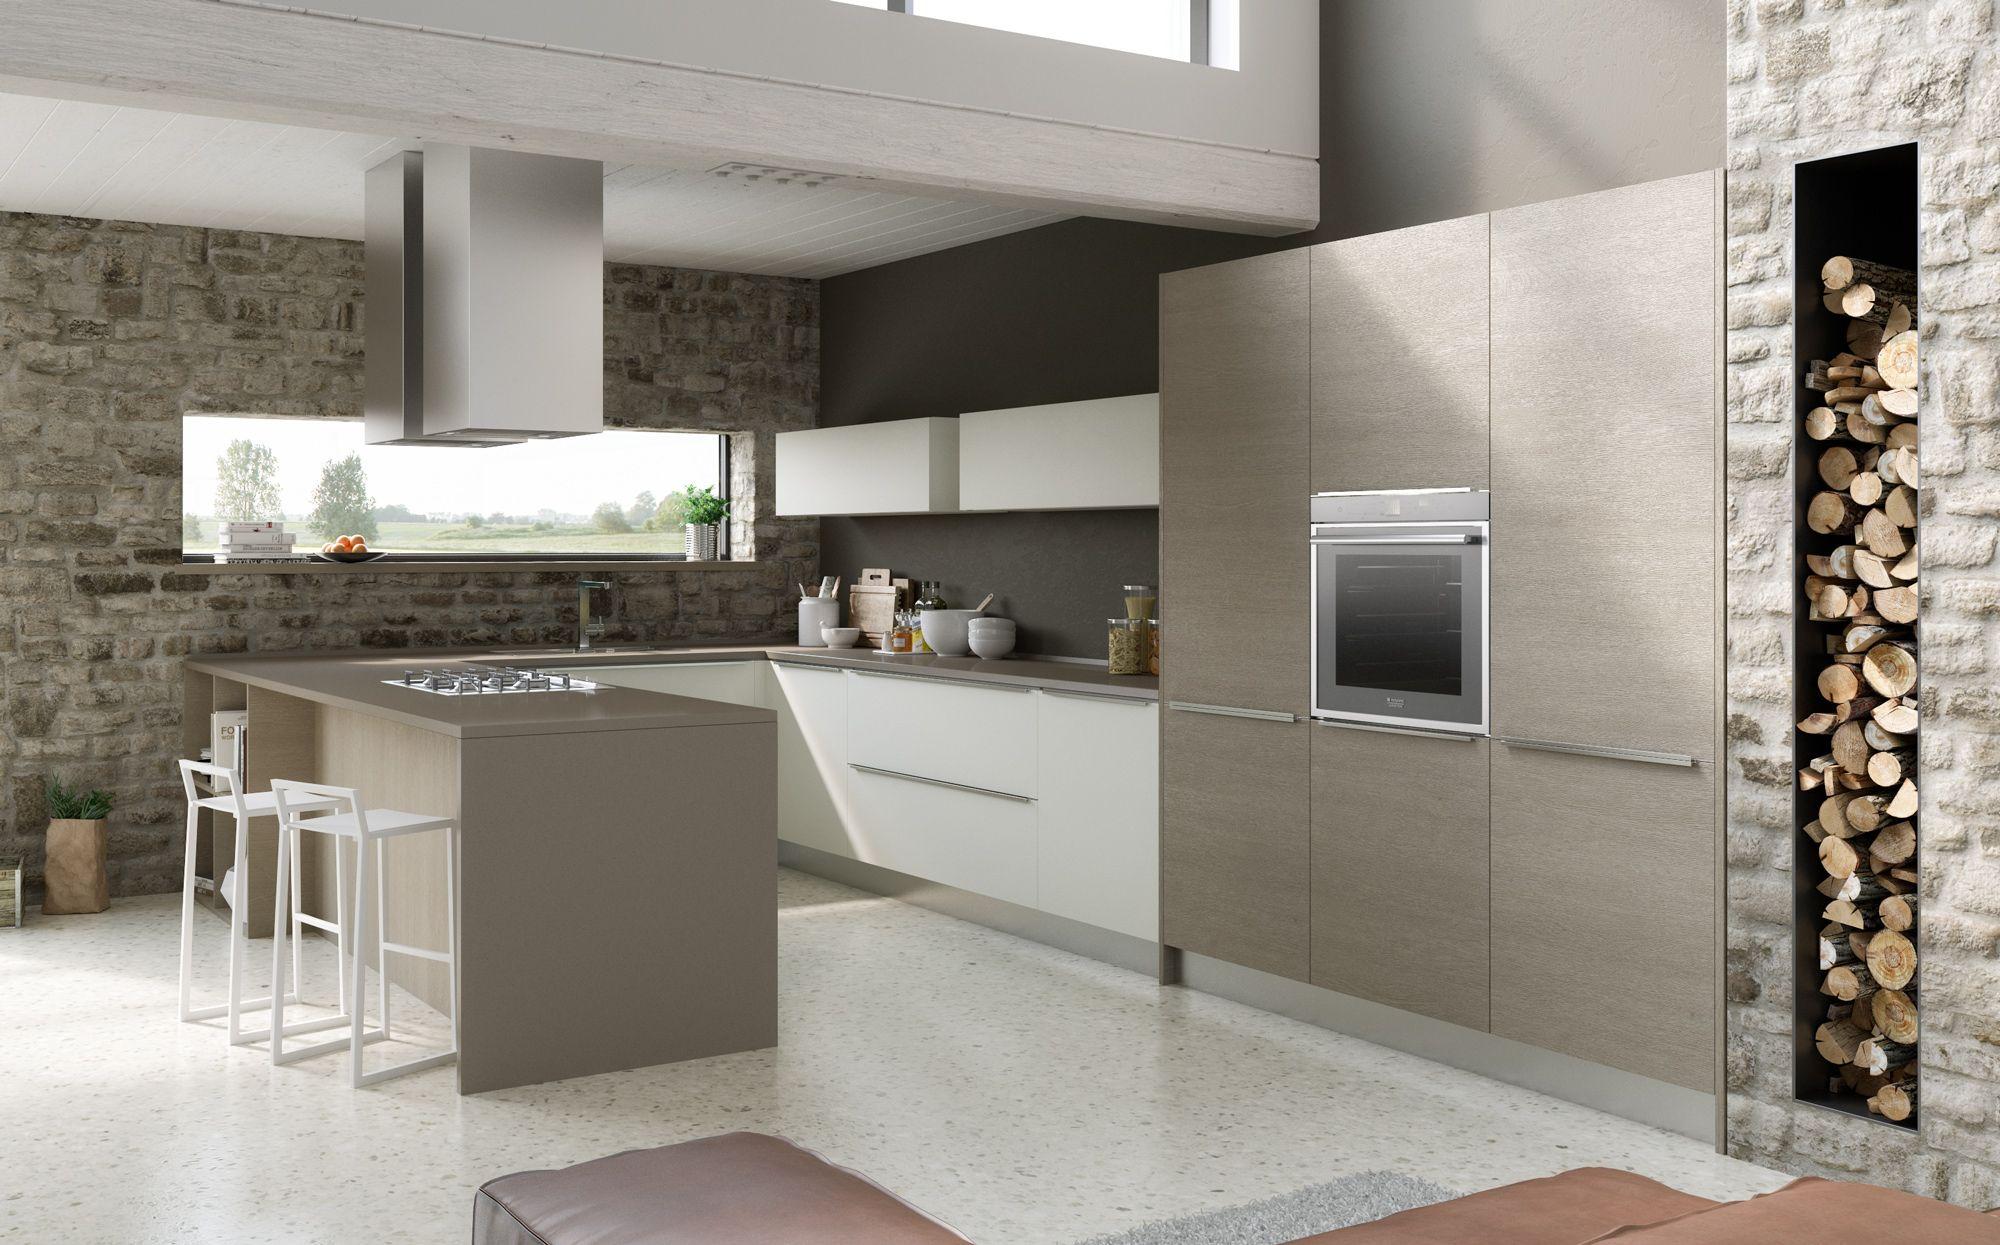 Sostituire piastrelle cucina stunning piastrelle cucina idee e soluzioni in ceramica e gres - Costo piastrelle cucina ...